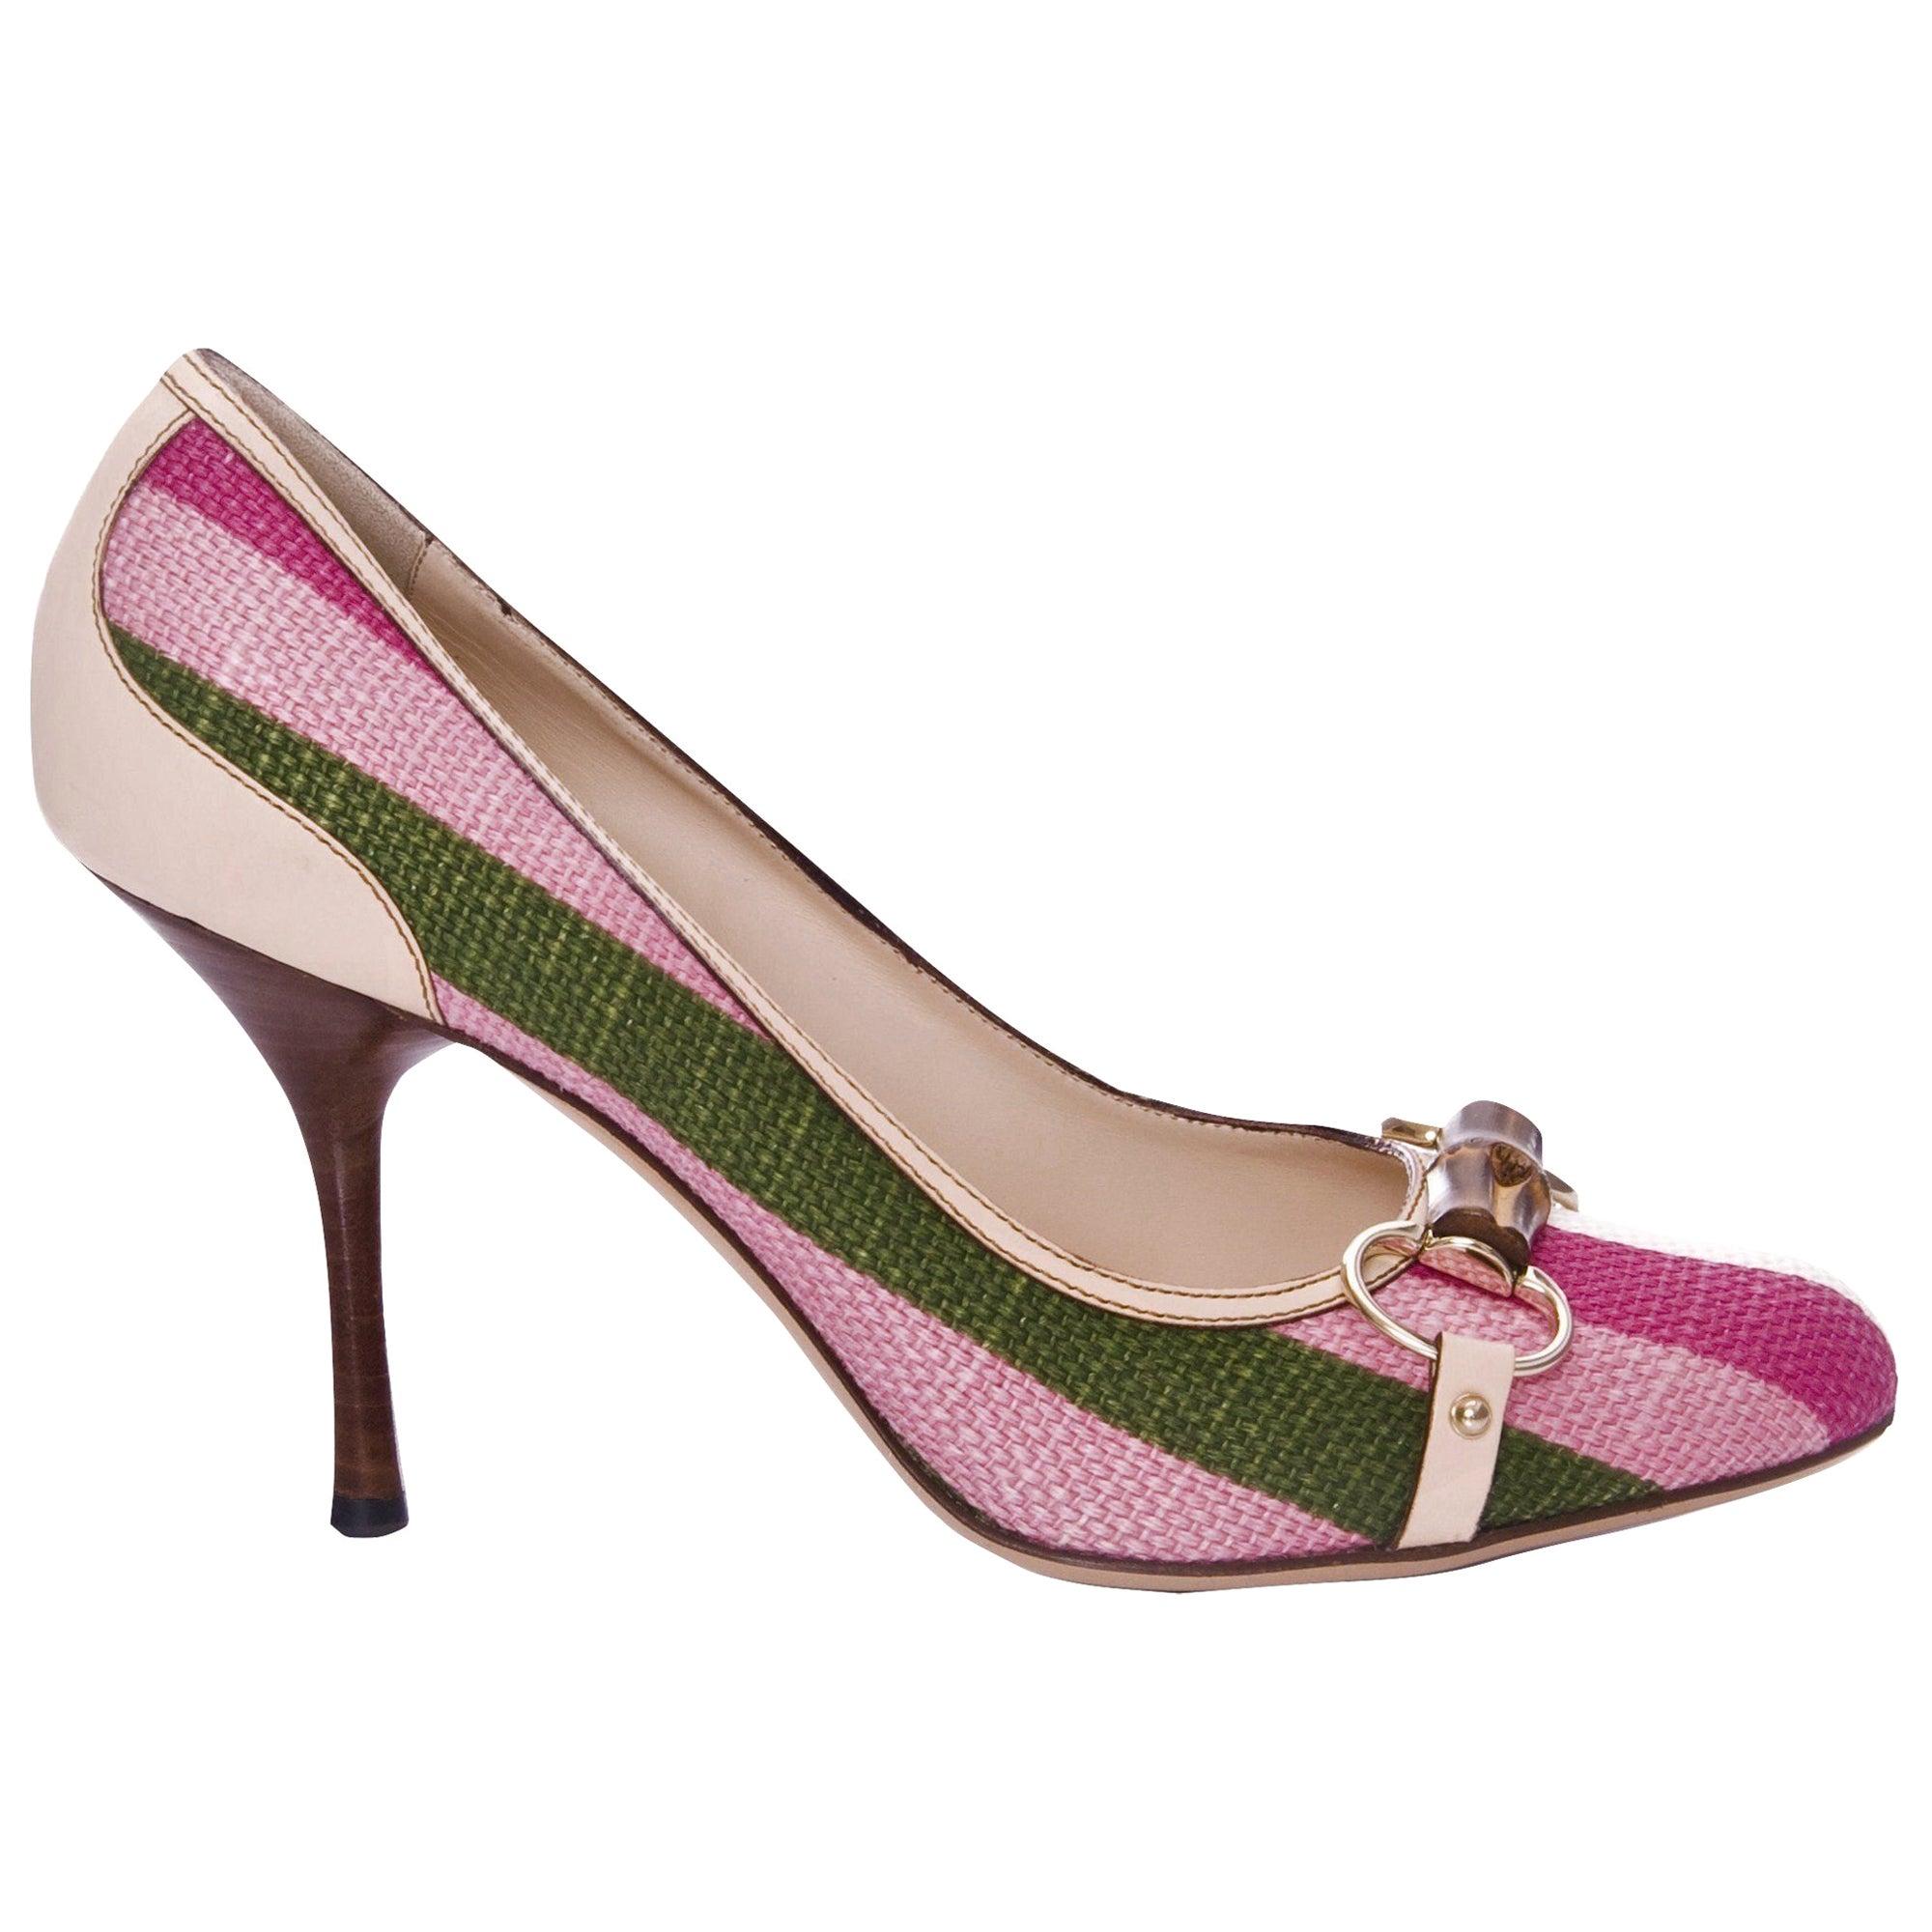 5a323d49a New Gucci Pink and Green Stripe Bamboo Web Horsebit Pumps Heels Sz 9.5 at  1stdibs